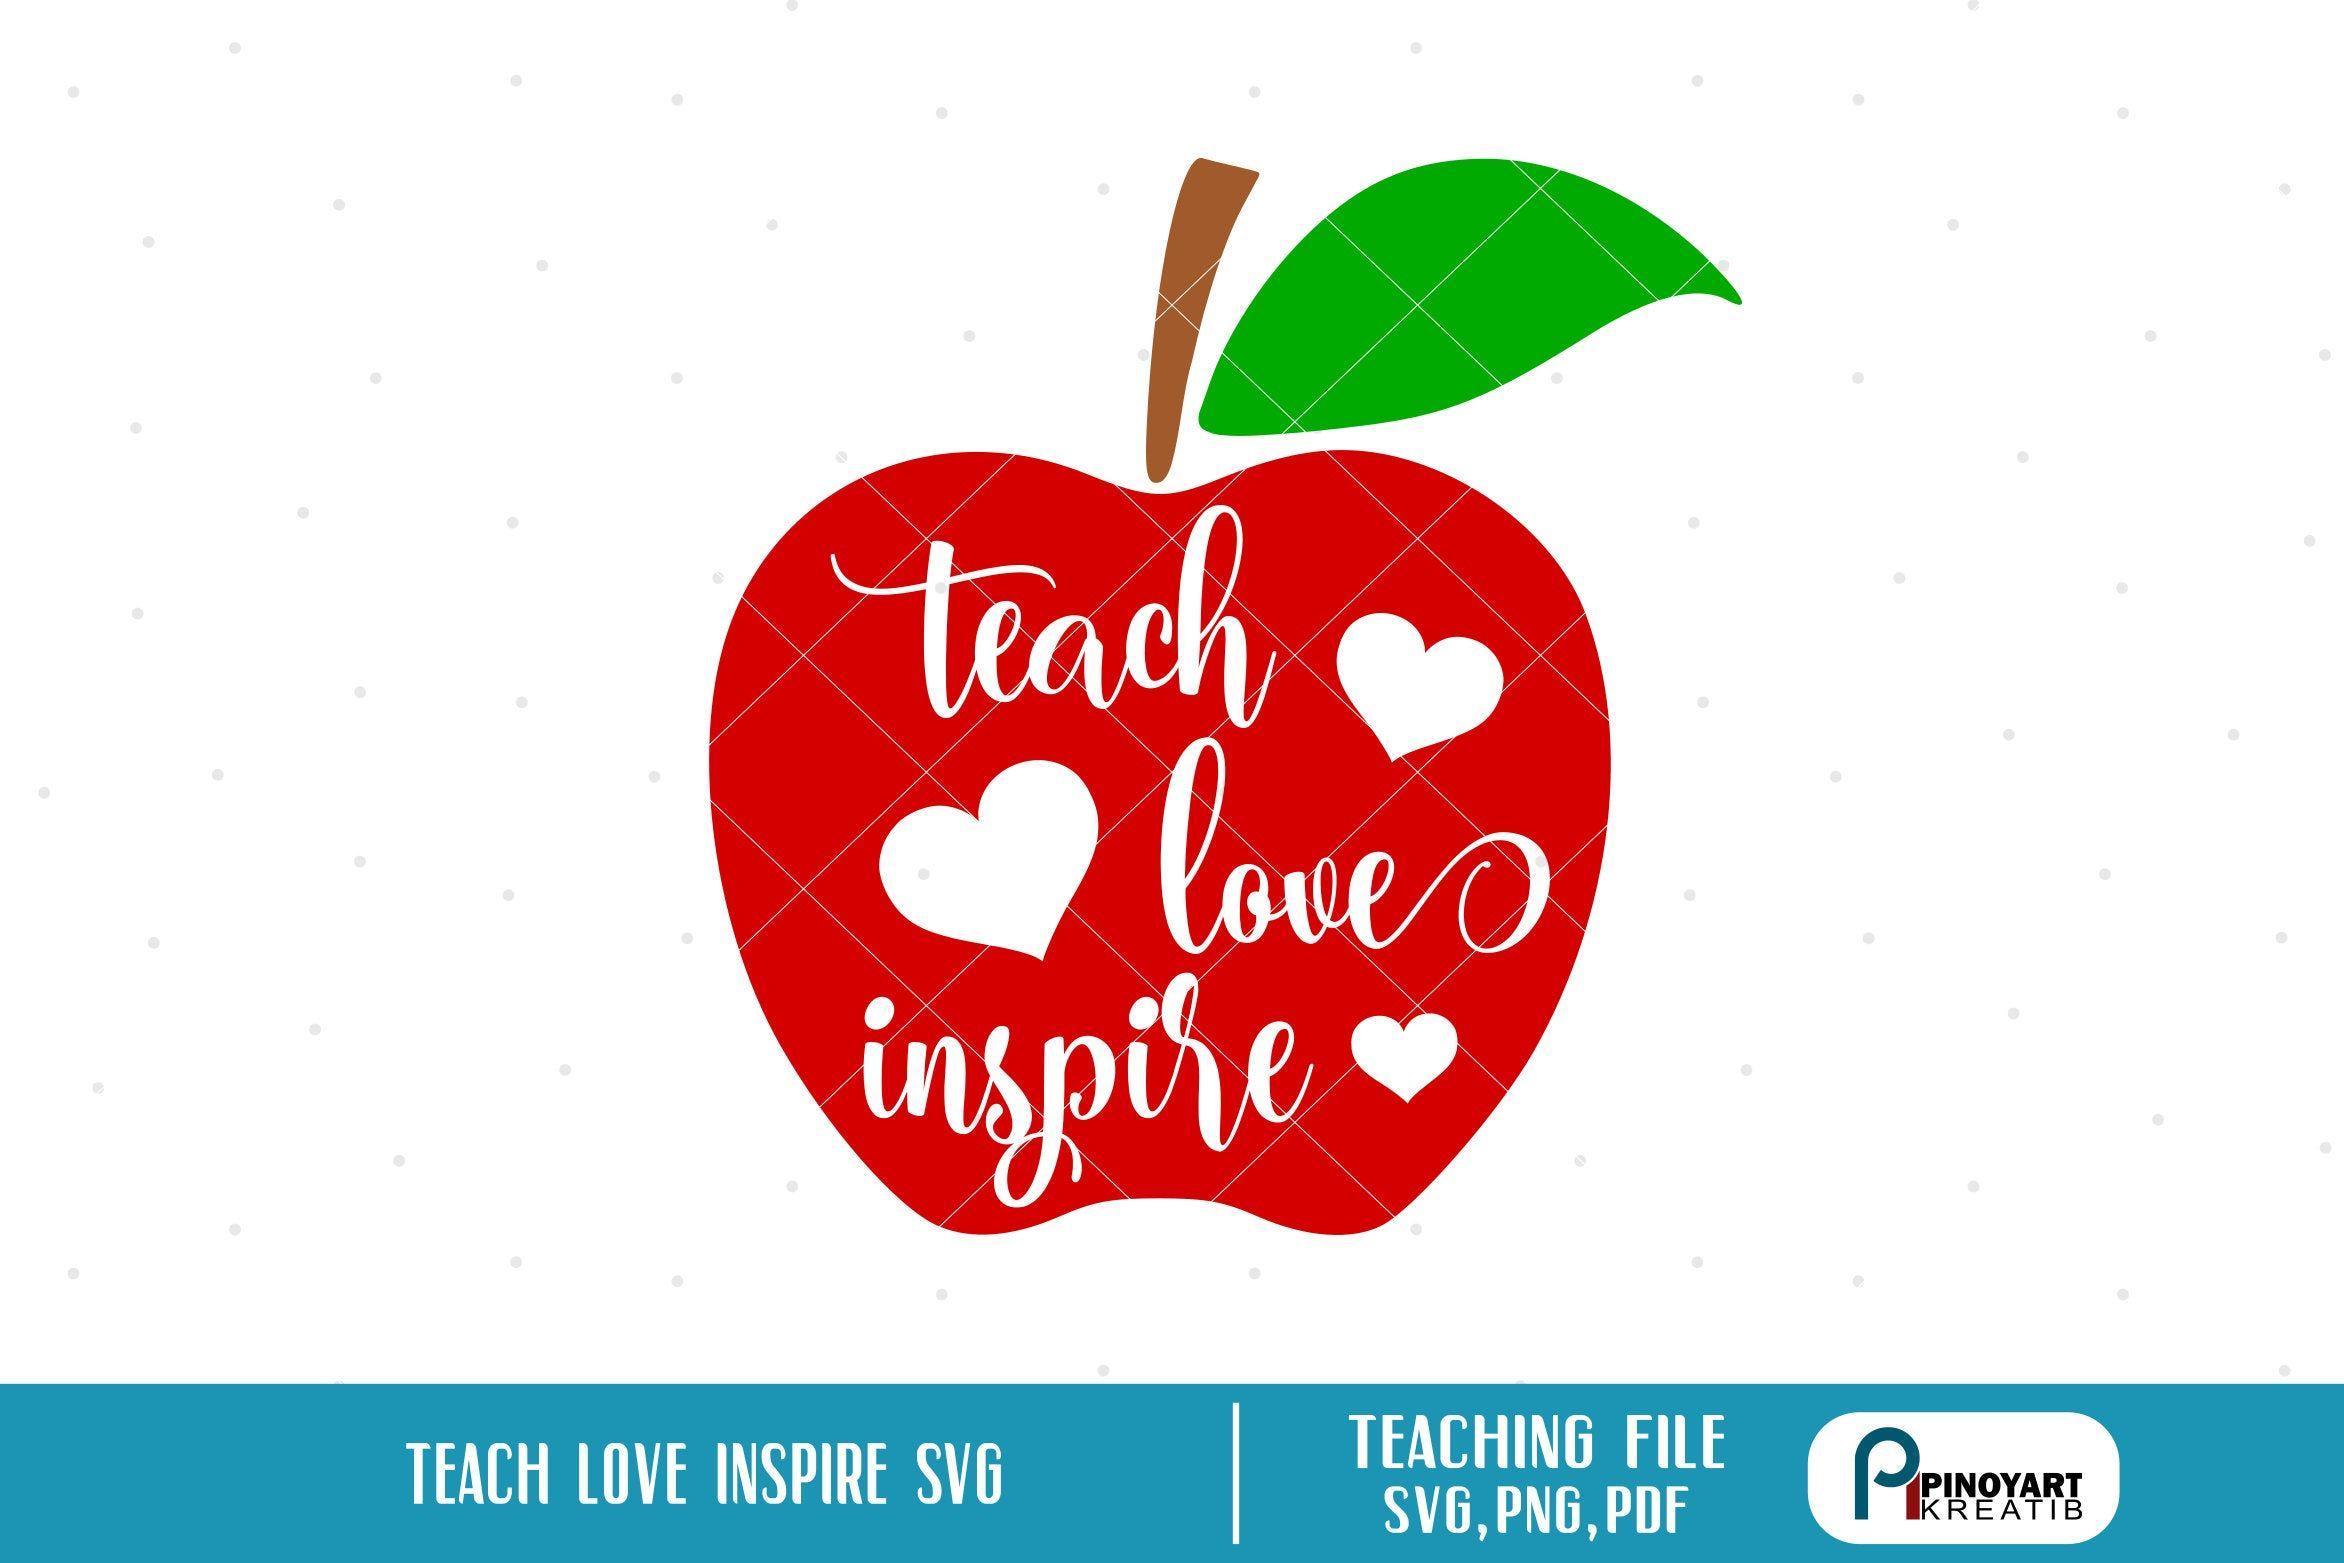 Teacher Svg Teacher Apple Svg Teach Love Inspire Svg Teaching Svg Teacher Clip Art Teaching Clip Art Apple Svg Teaching Clipart Teacher Clipart Teaching